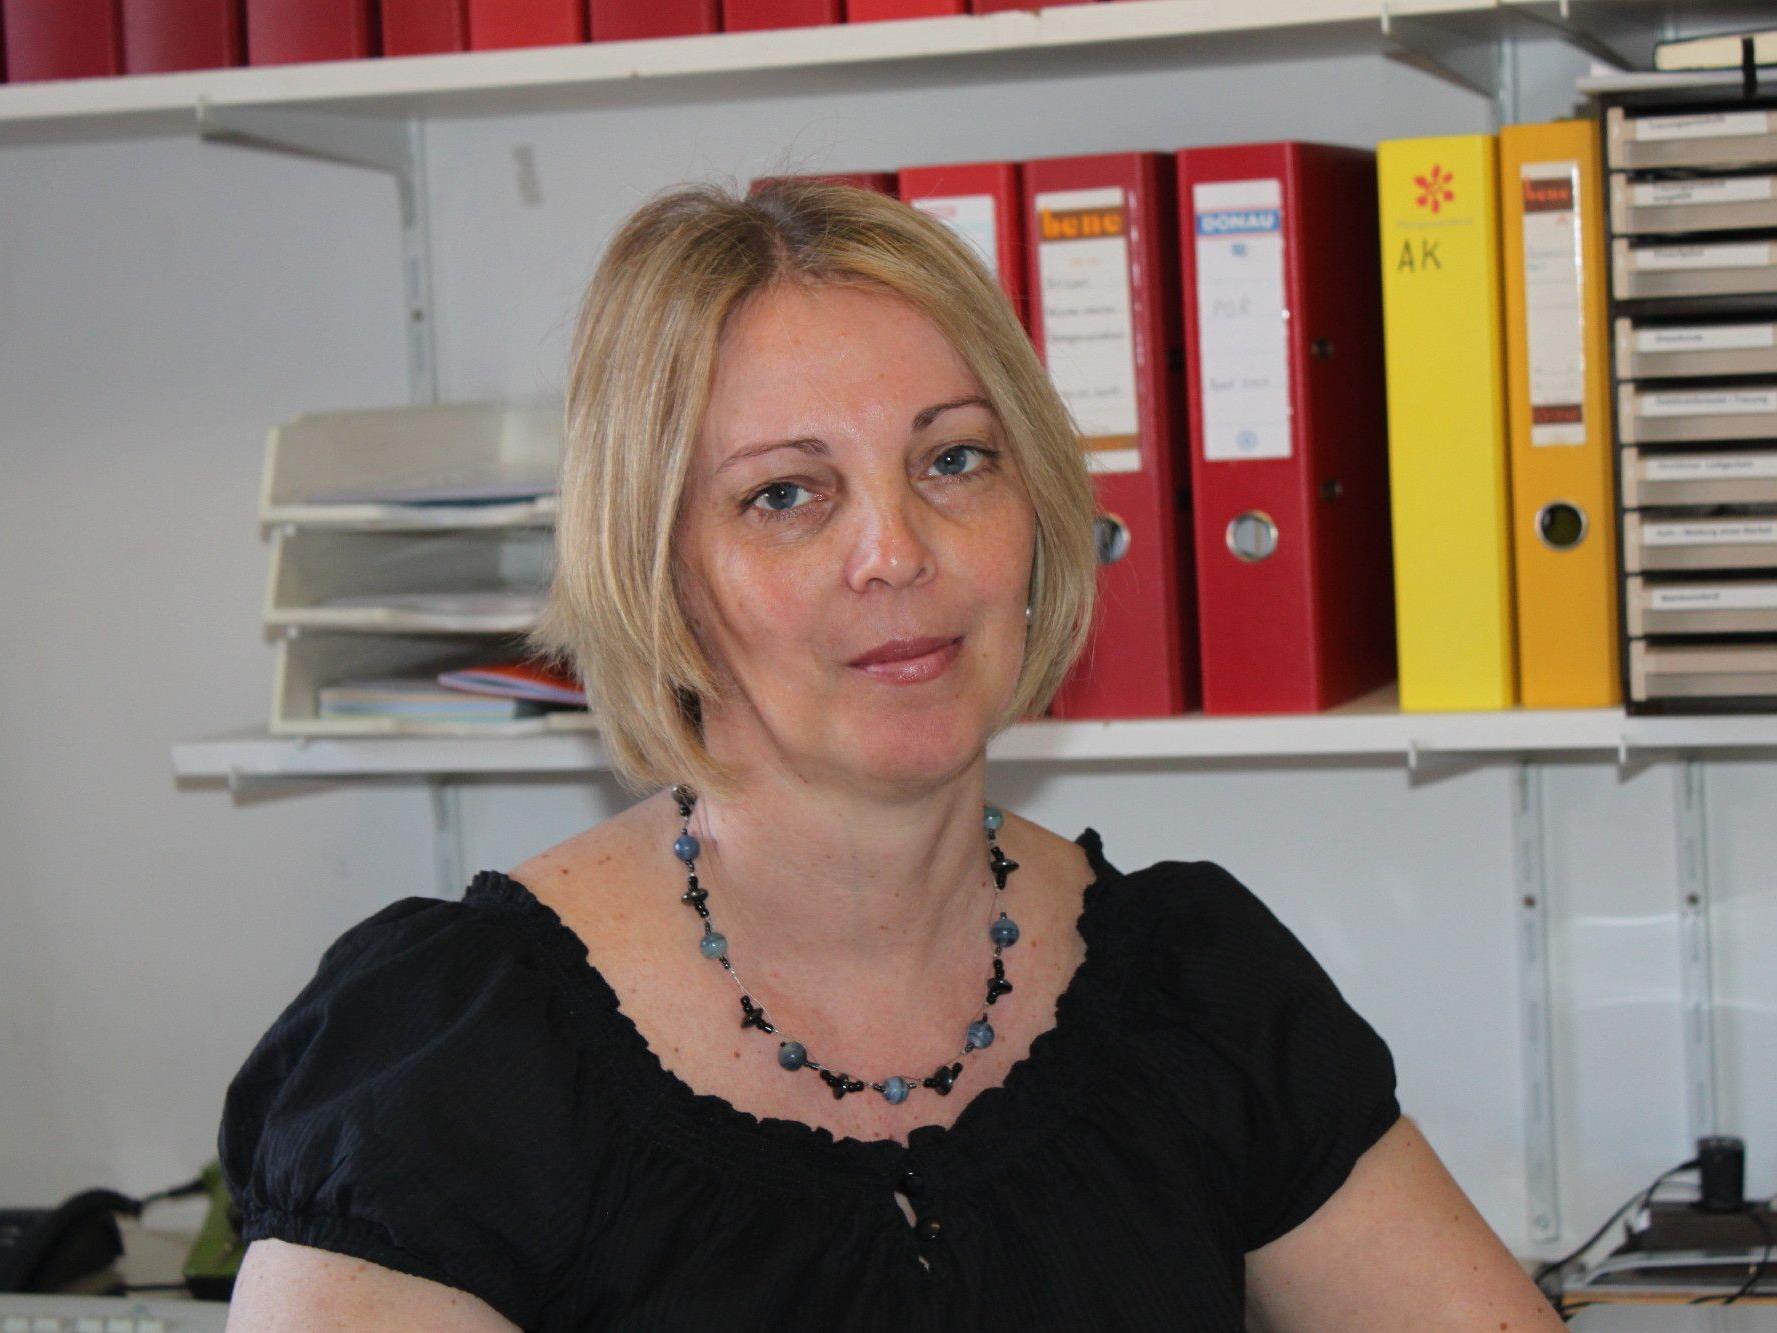 Pfarrkoordinatorin in Fraxern: Marion Brändle